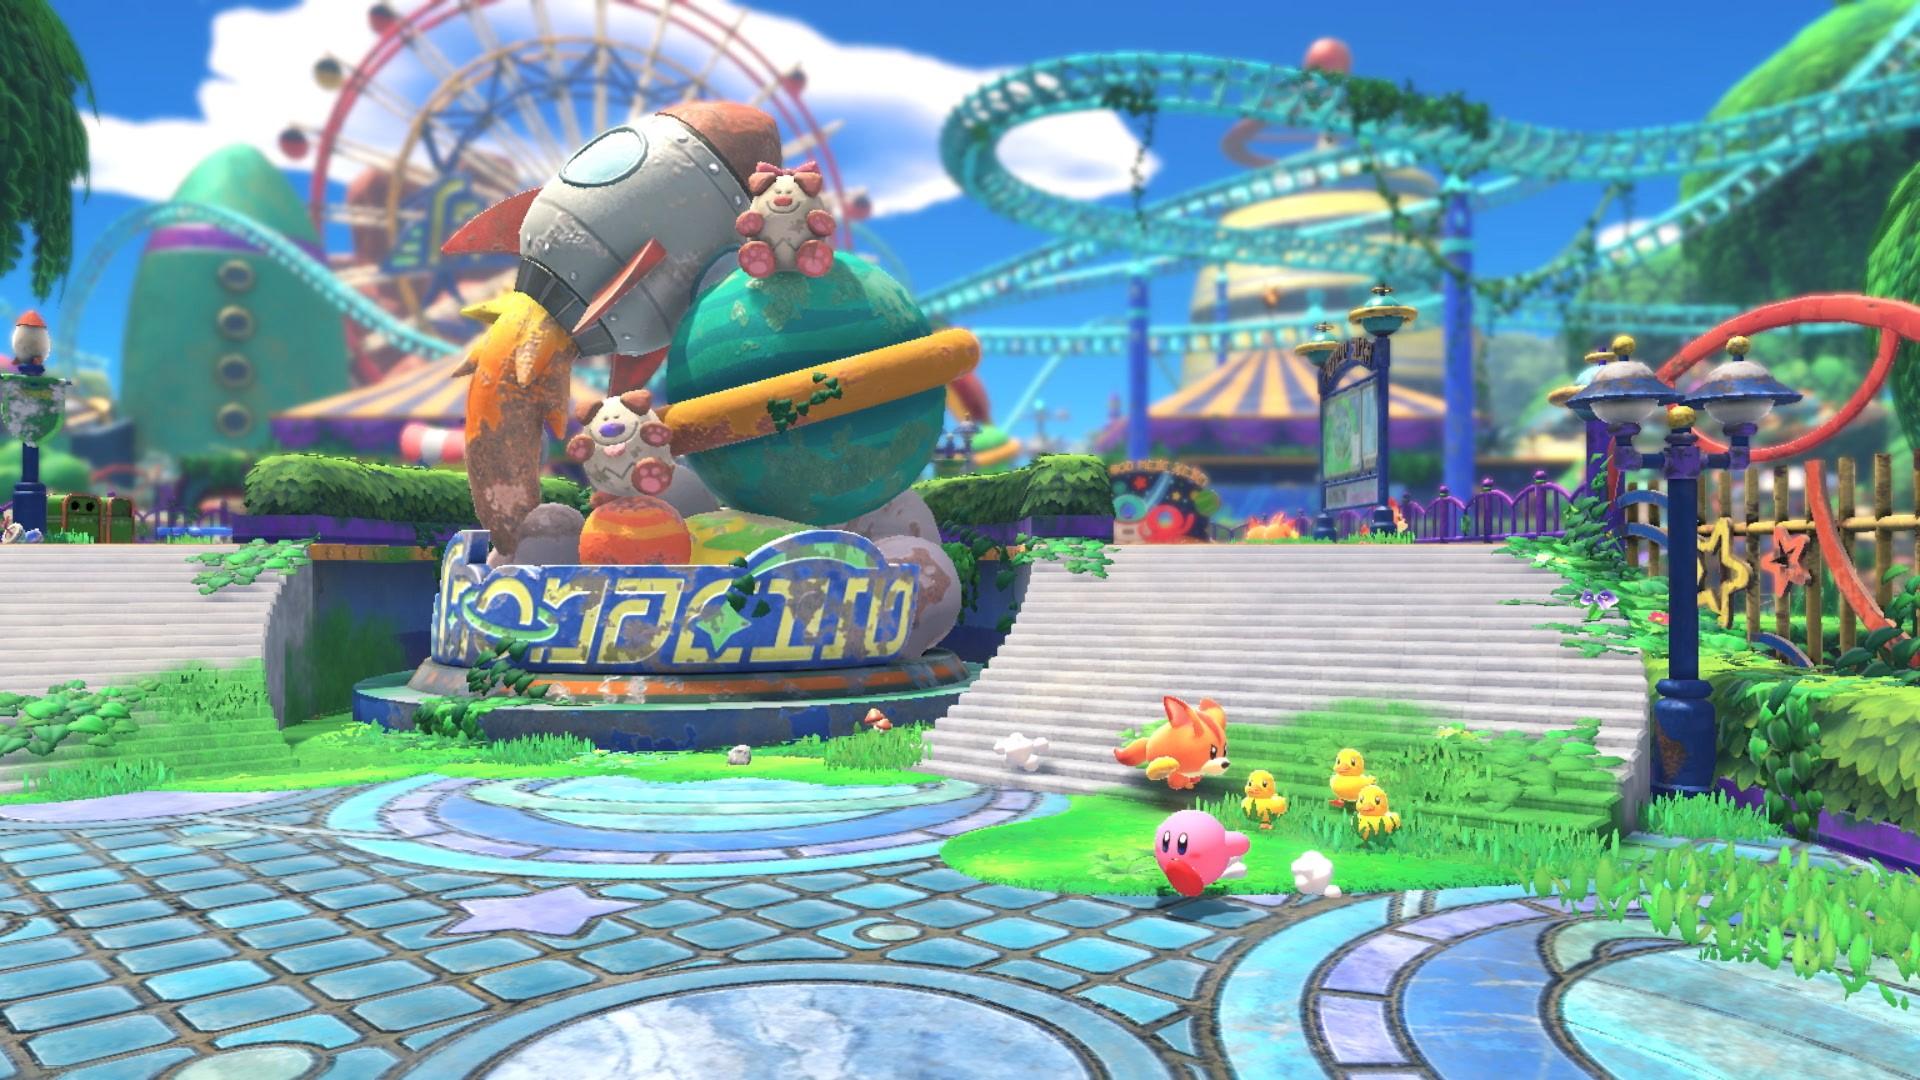 NintendoSwitch_Kirby_scrn04.jpg